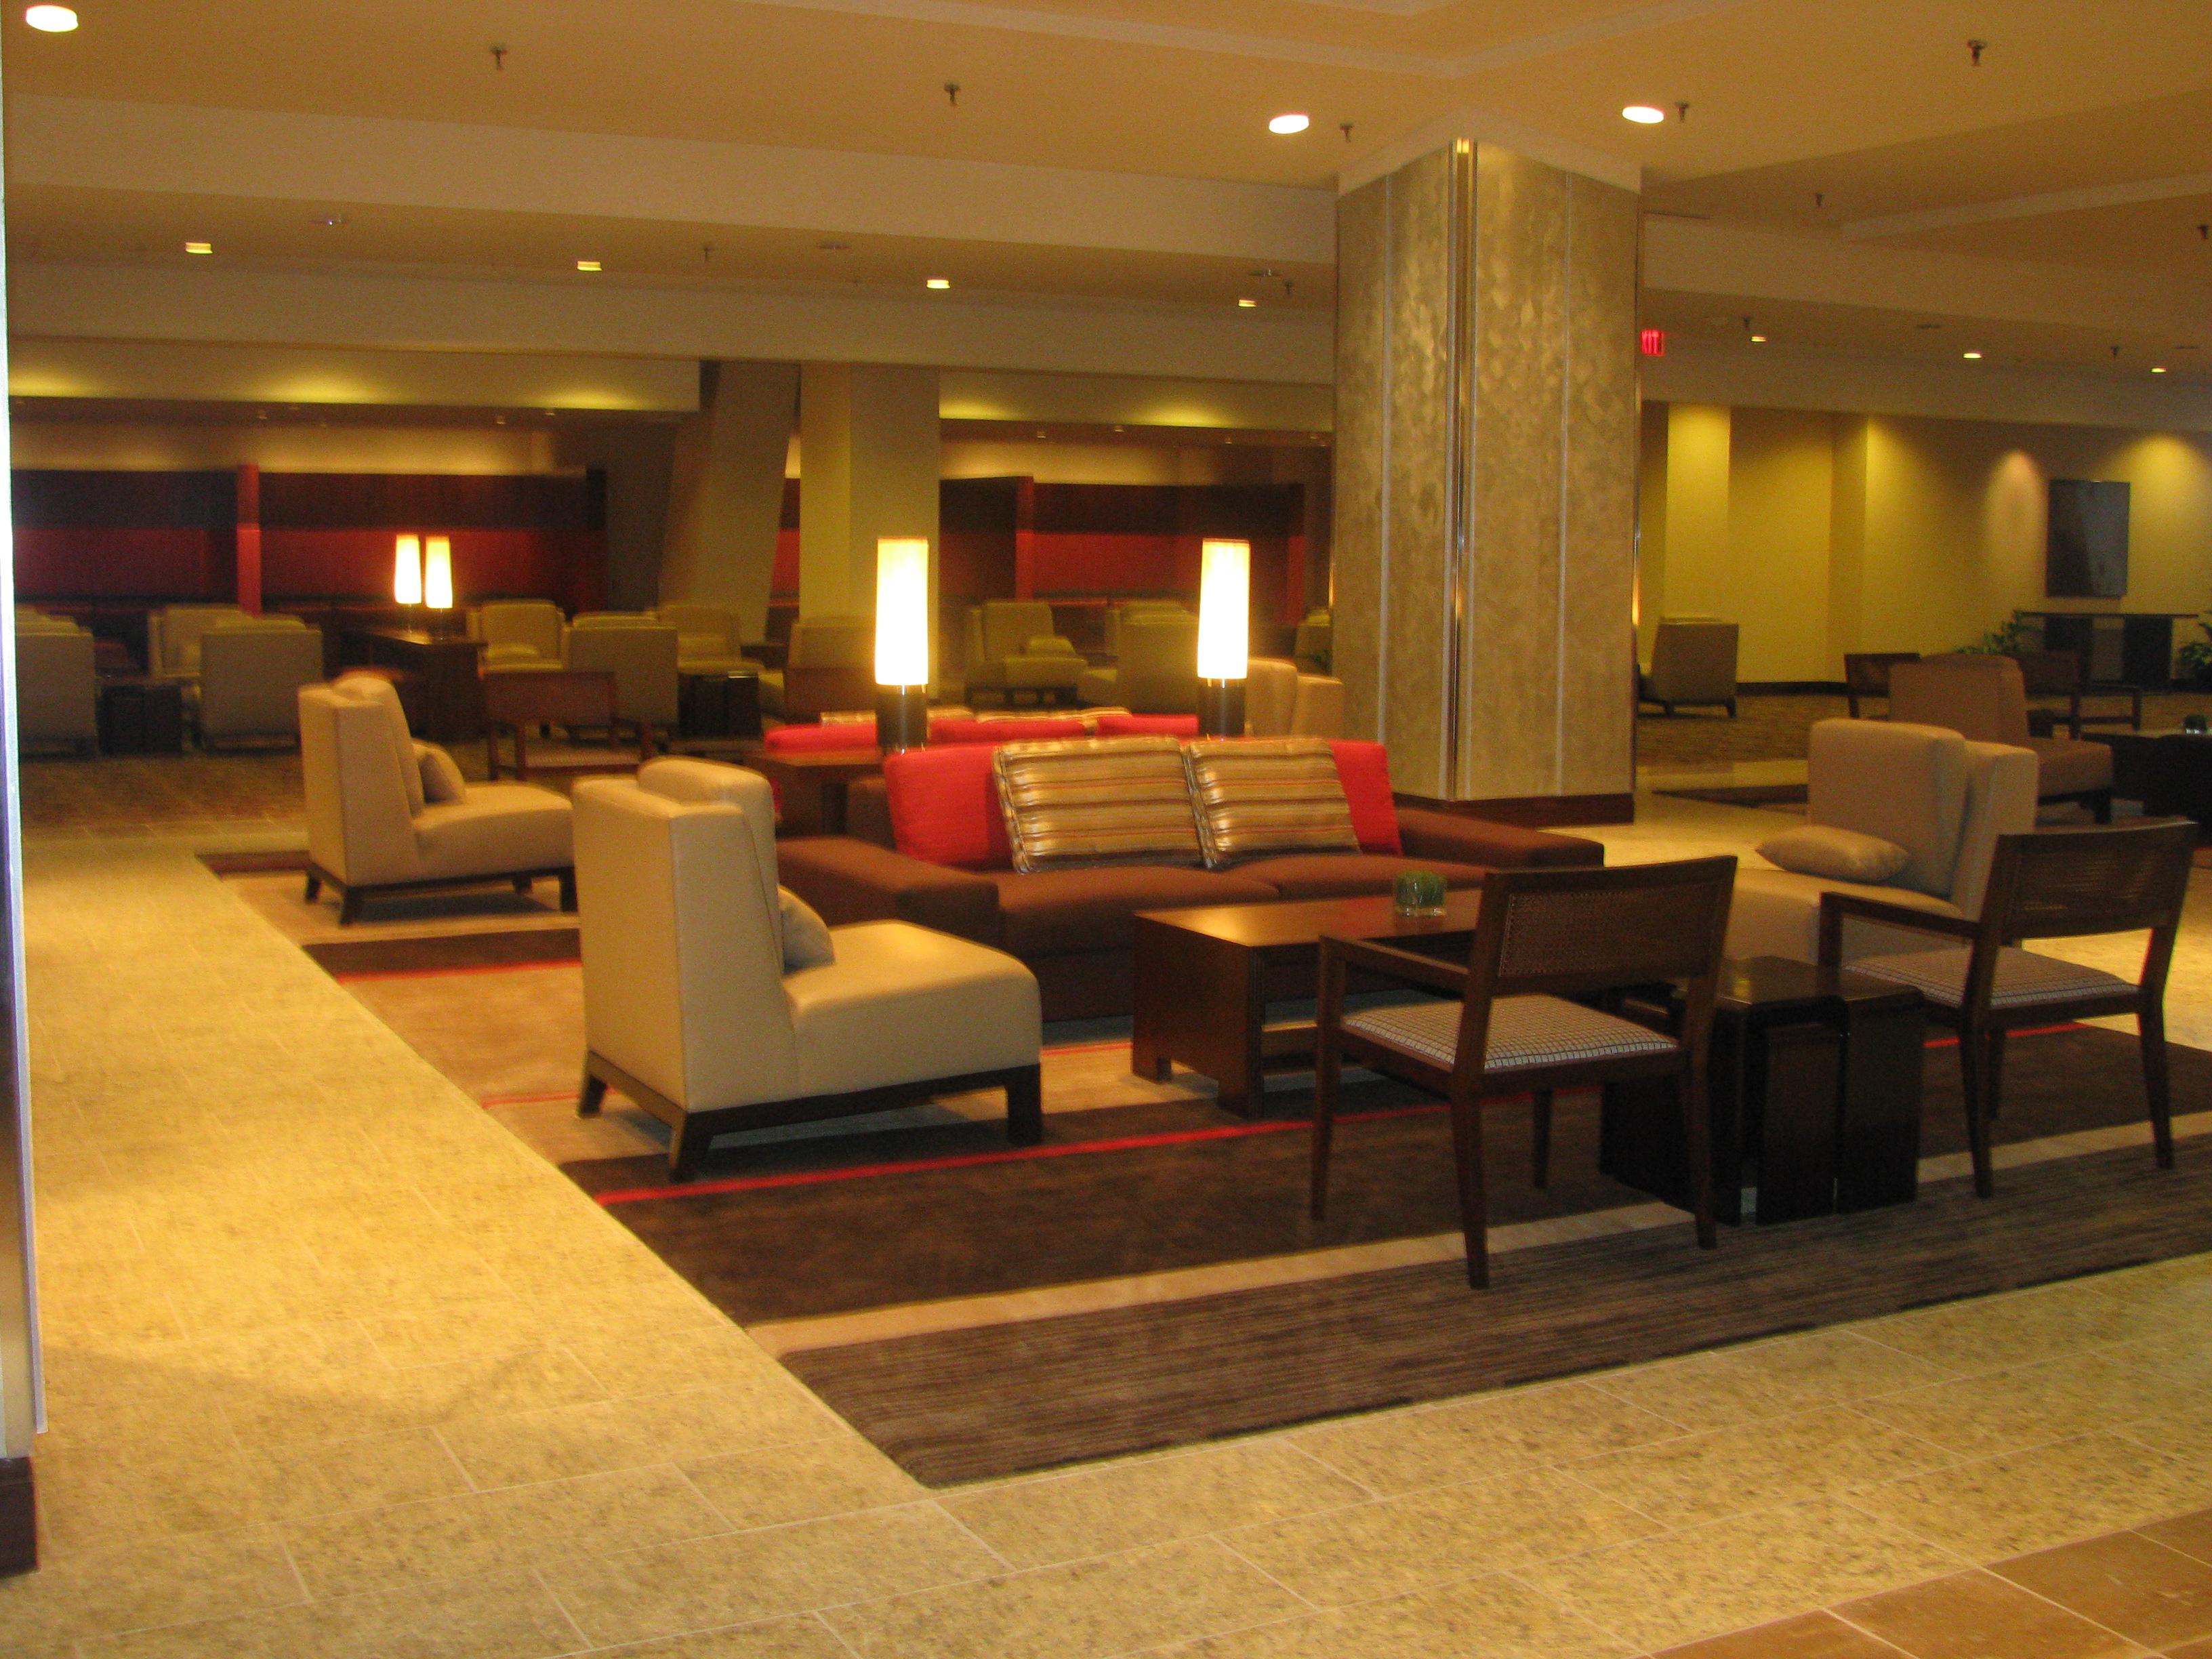 Hotel lobby furniture - Lounge Furniture China Lobby Furniture Hotel